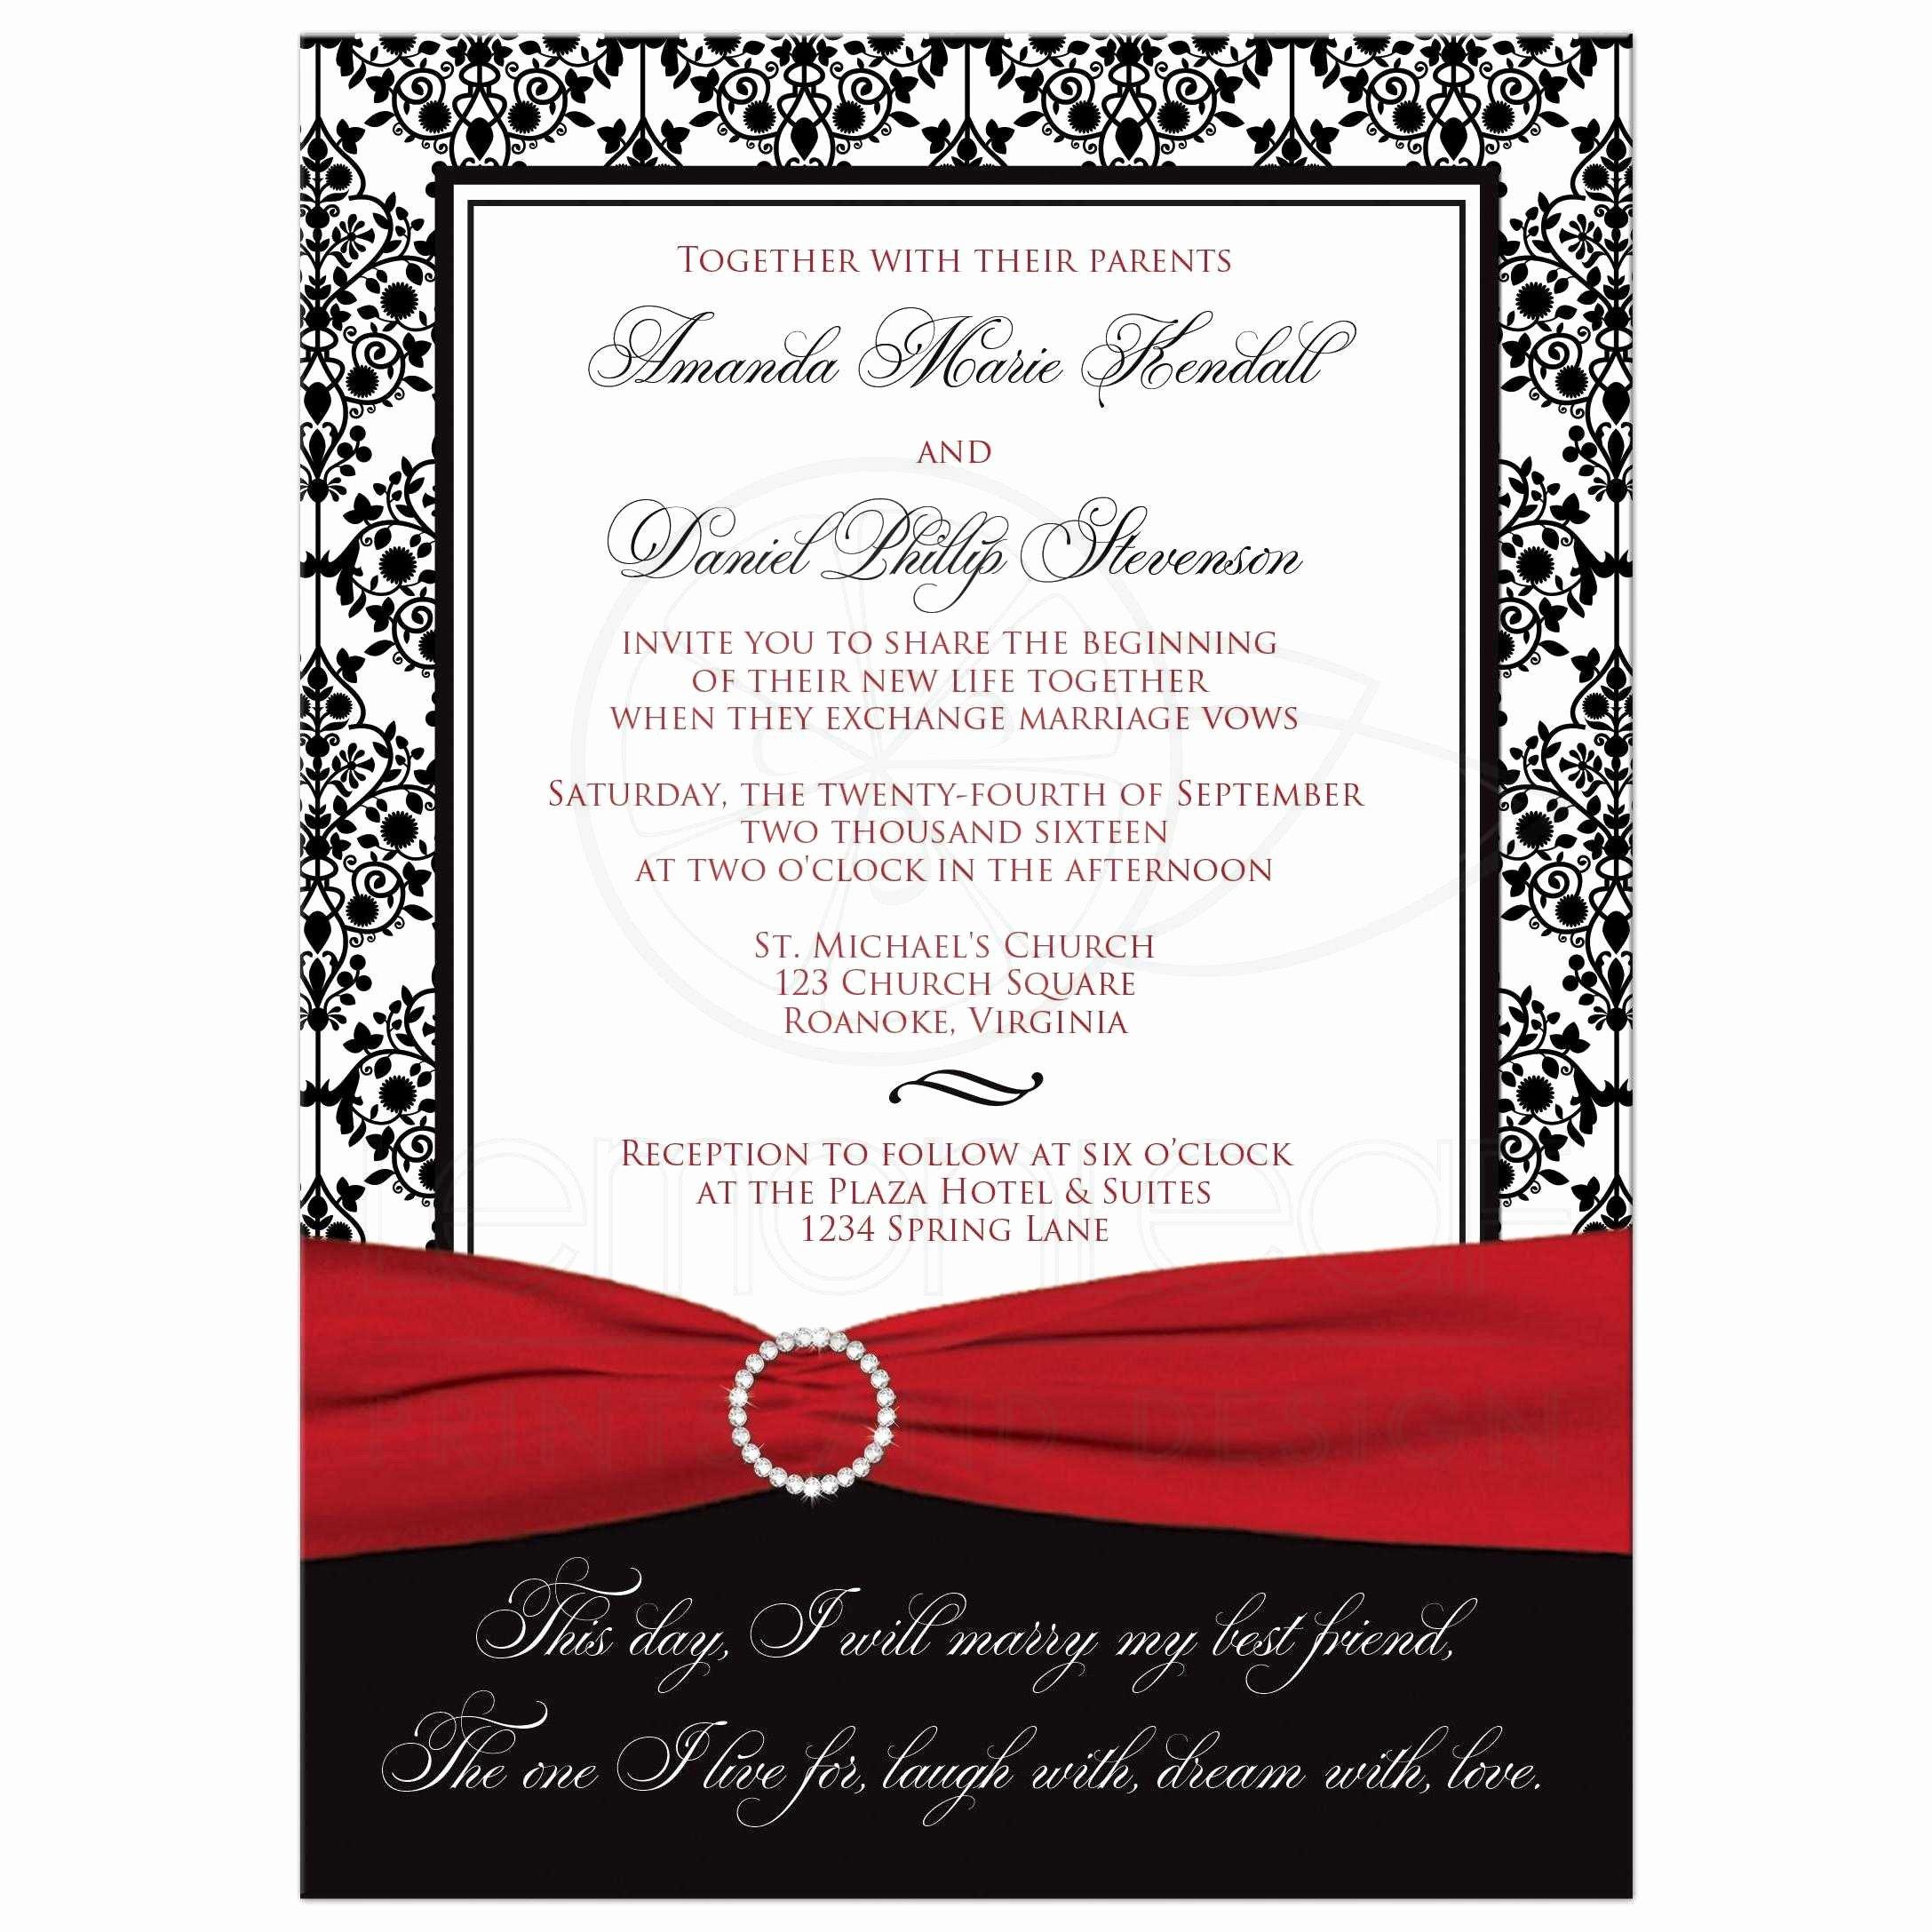 Black and White Invitation Unique Wedding Invitation Black White Damask Printed Red Ribbon